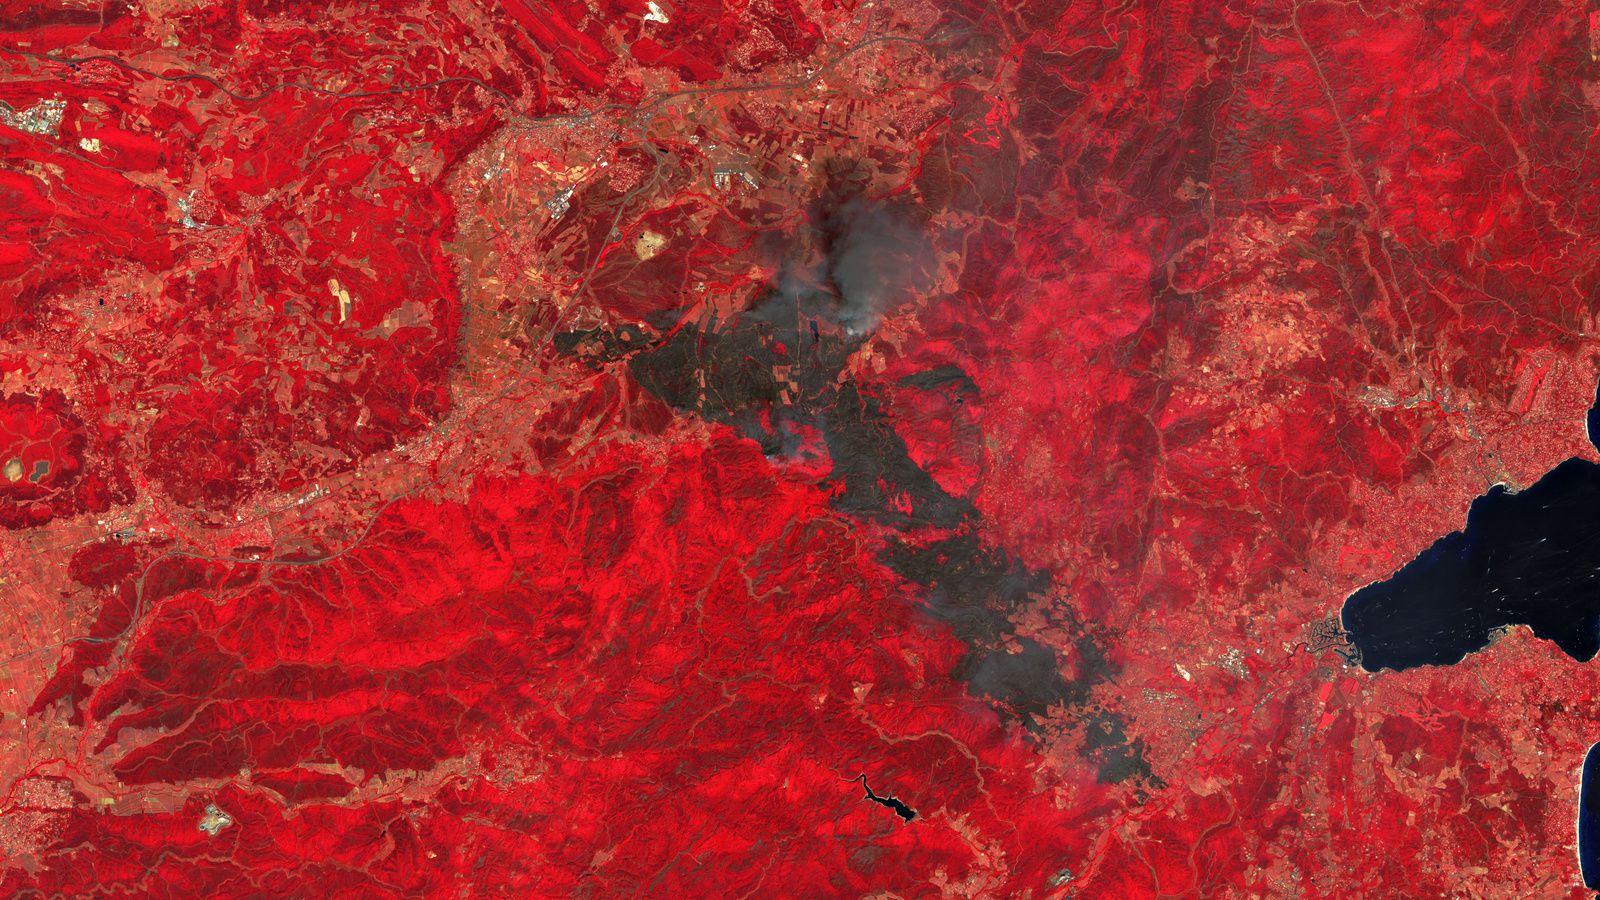 Var - Massif des Maures - Incendie - Août 2021 - Sentinel-2 - Satellite - Copernicus - Wild fires - Emergency response - Proche infrarouge